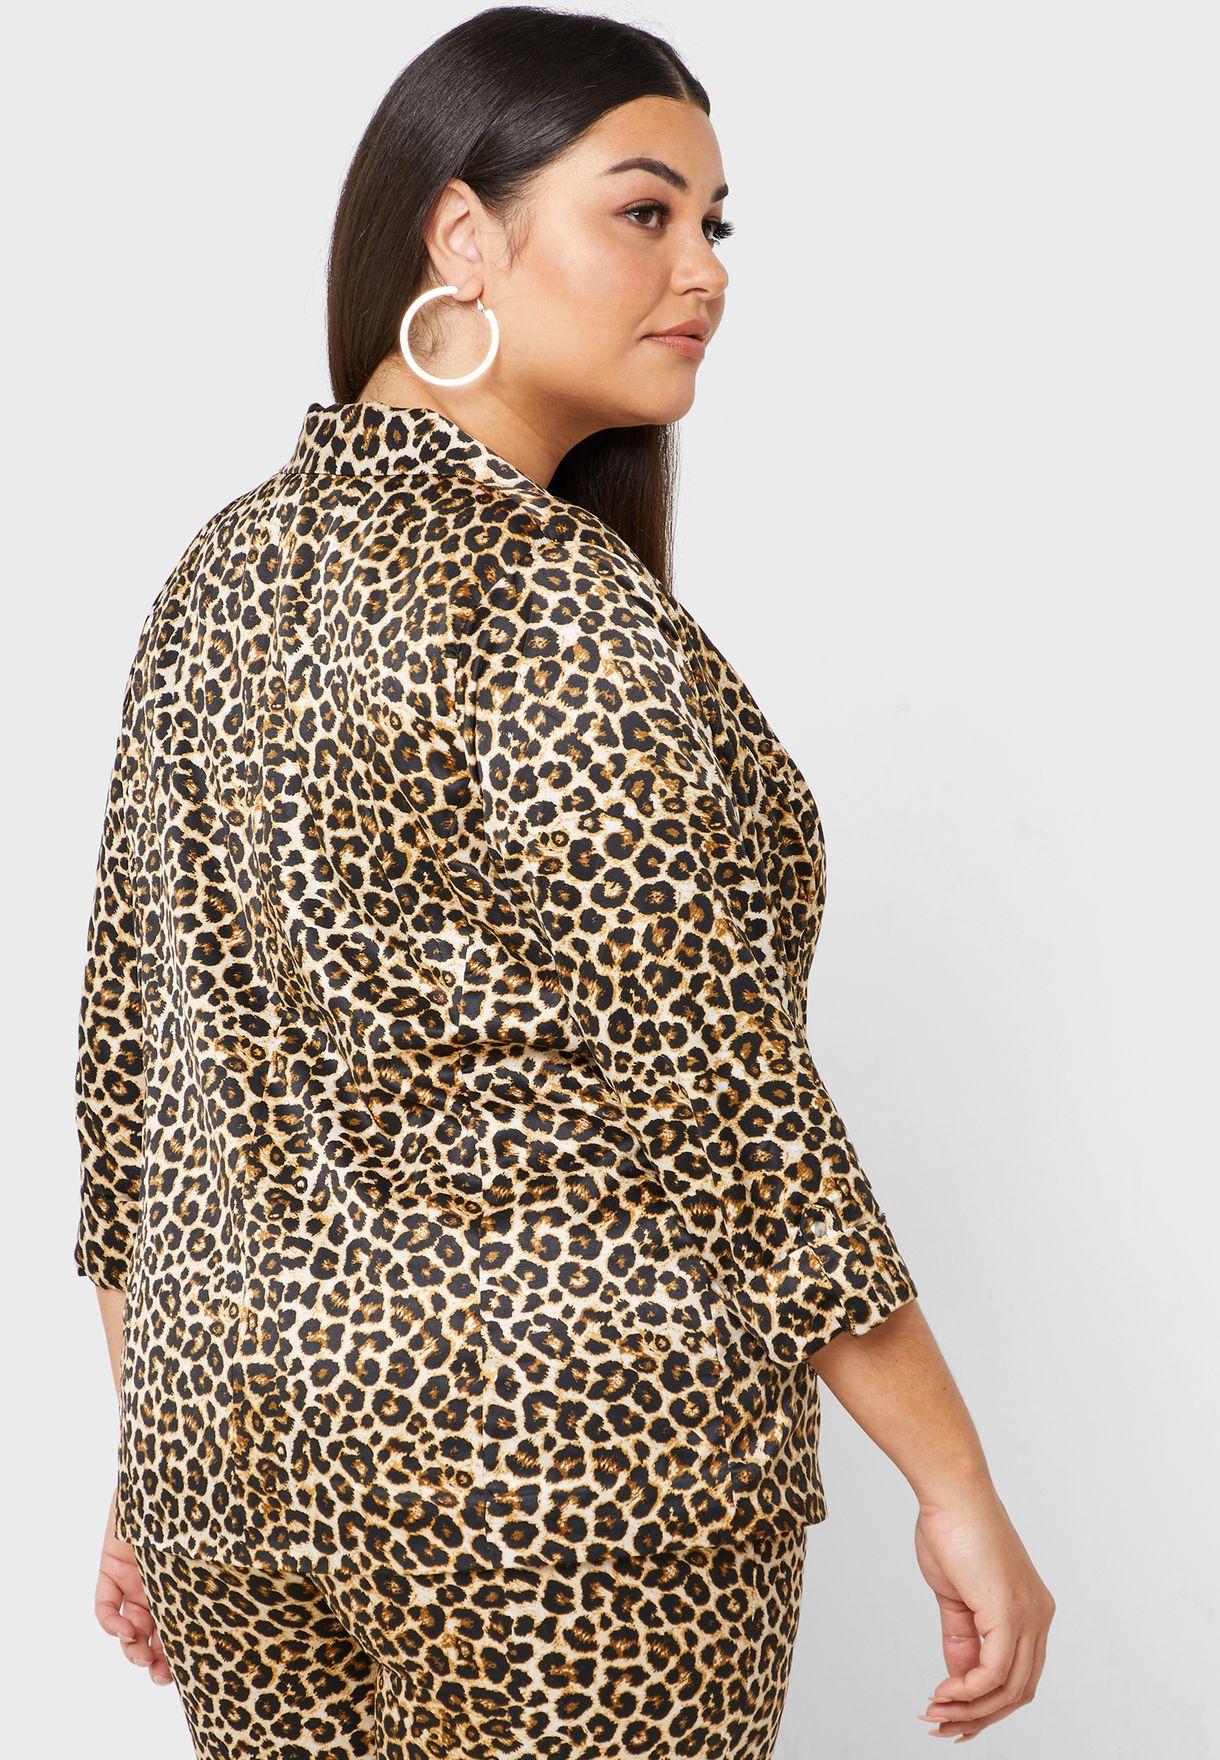 Leopard Print Blazer Co-ord